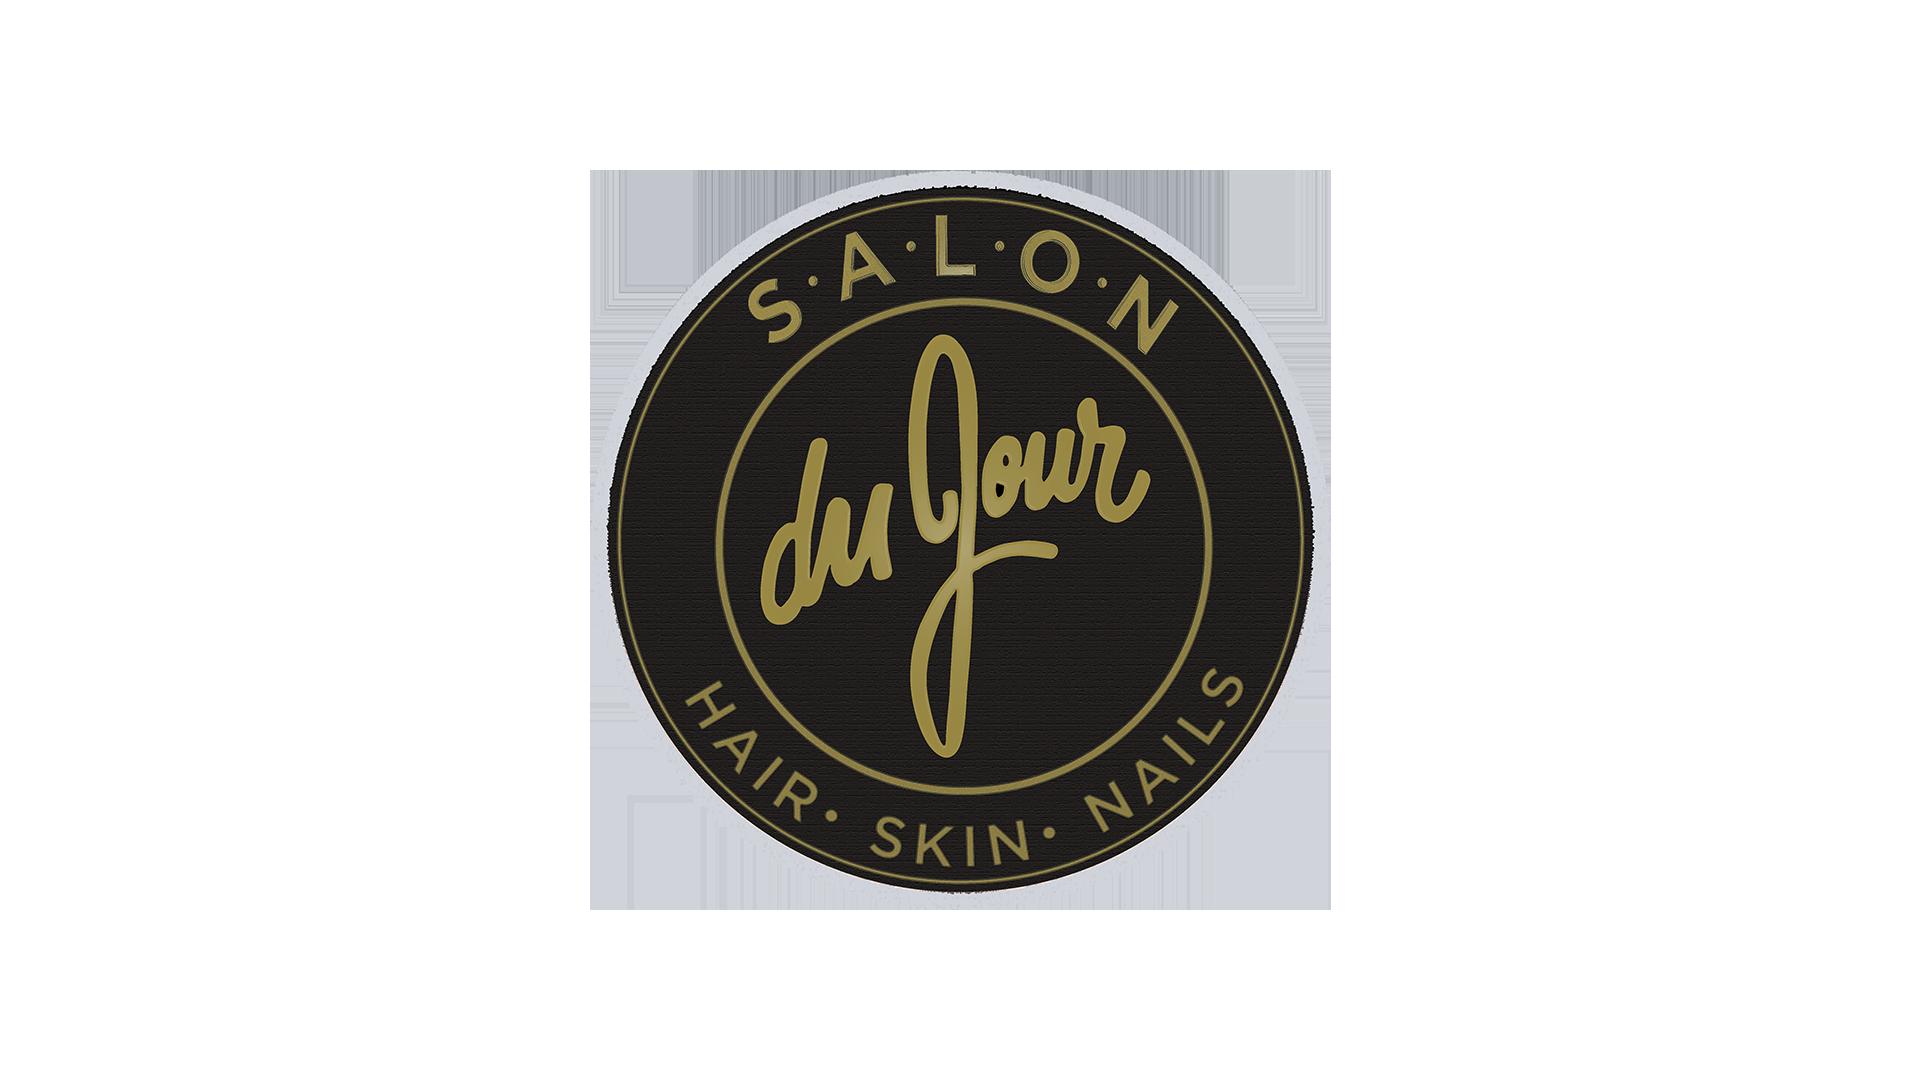 SalonDu-client.png